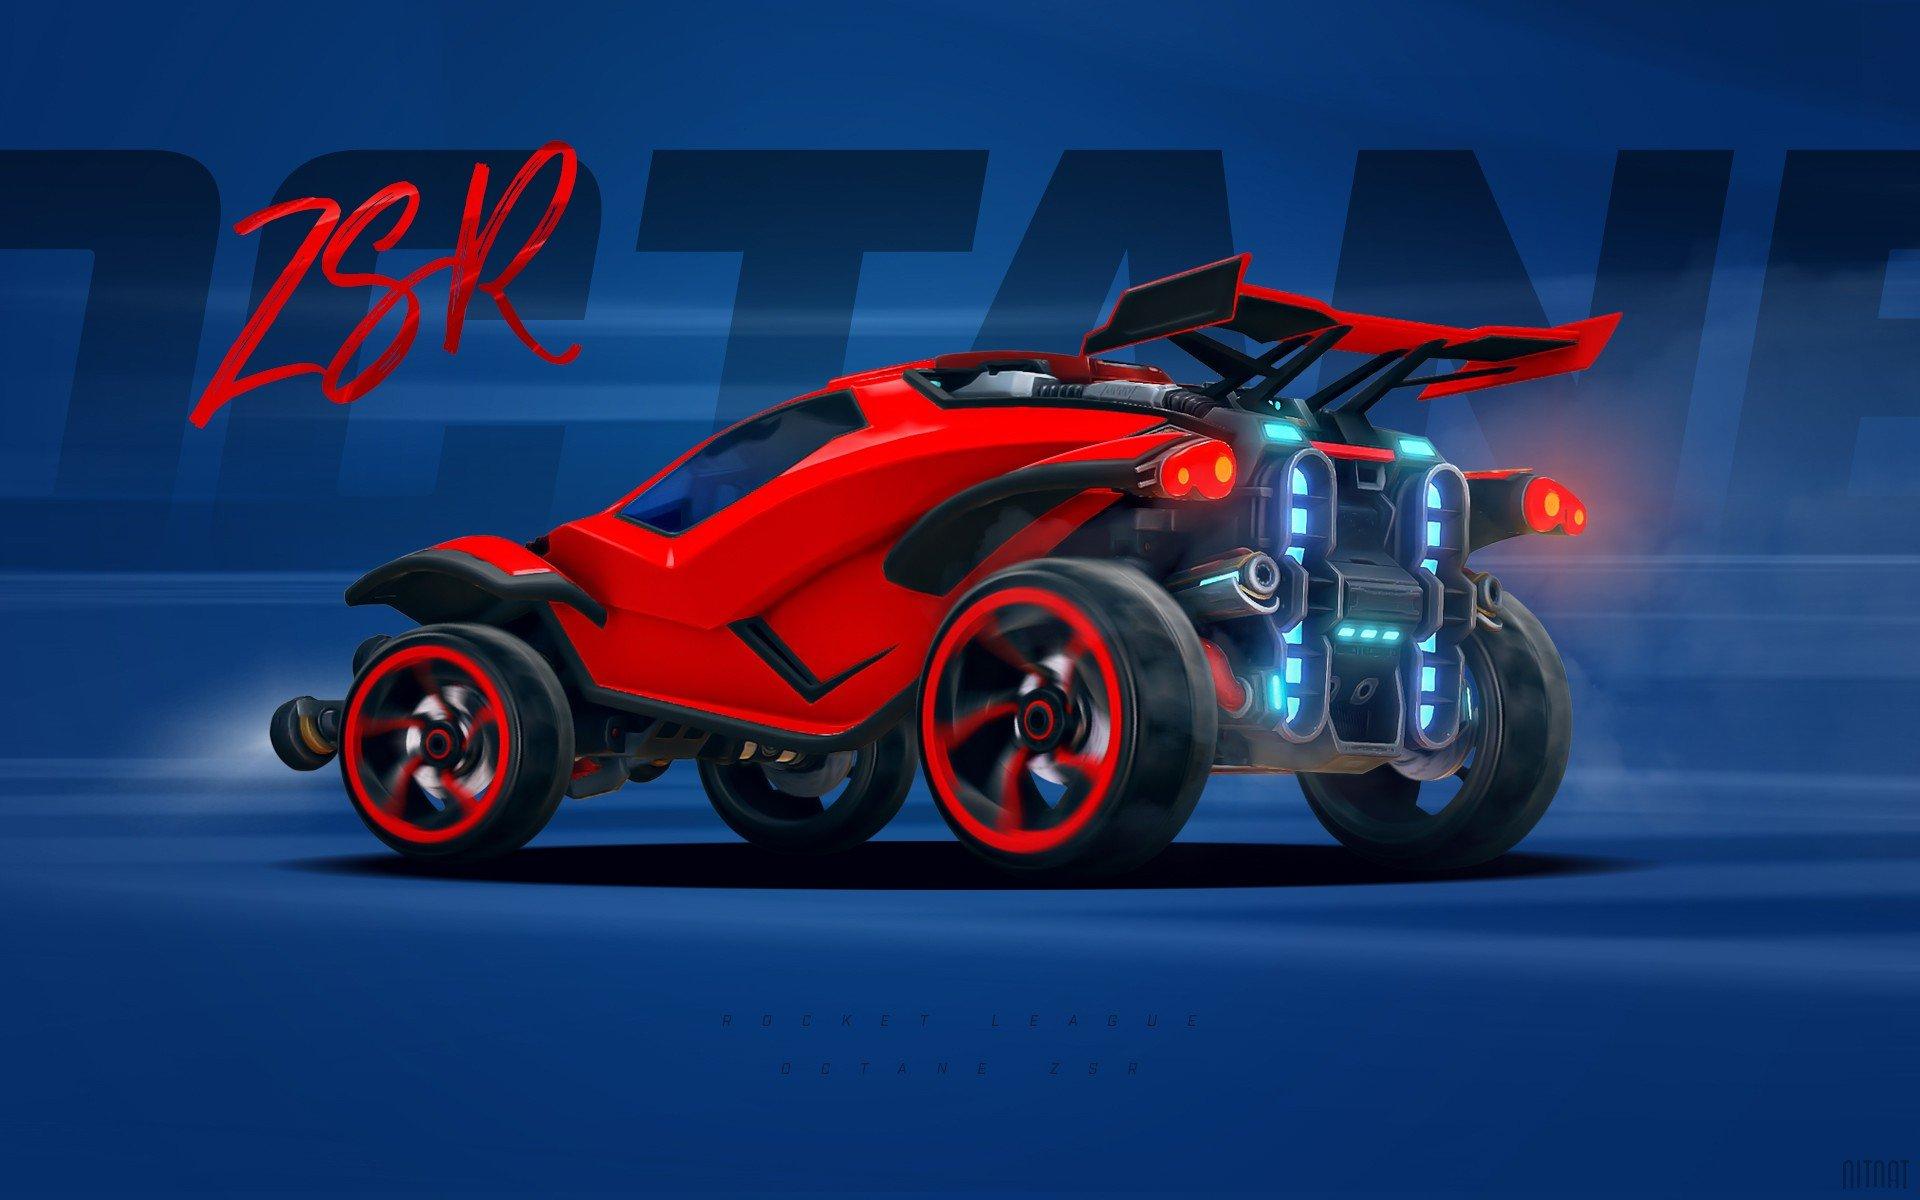 Epic Animal Wallpapers Rocket League Video Games Render Octane Zsr Wallpapers